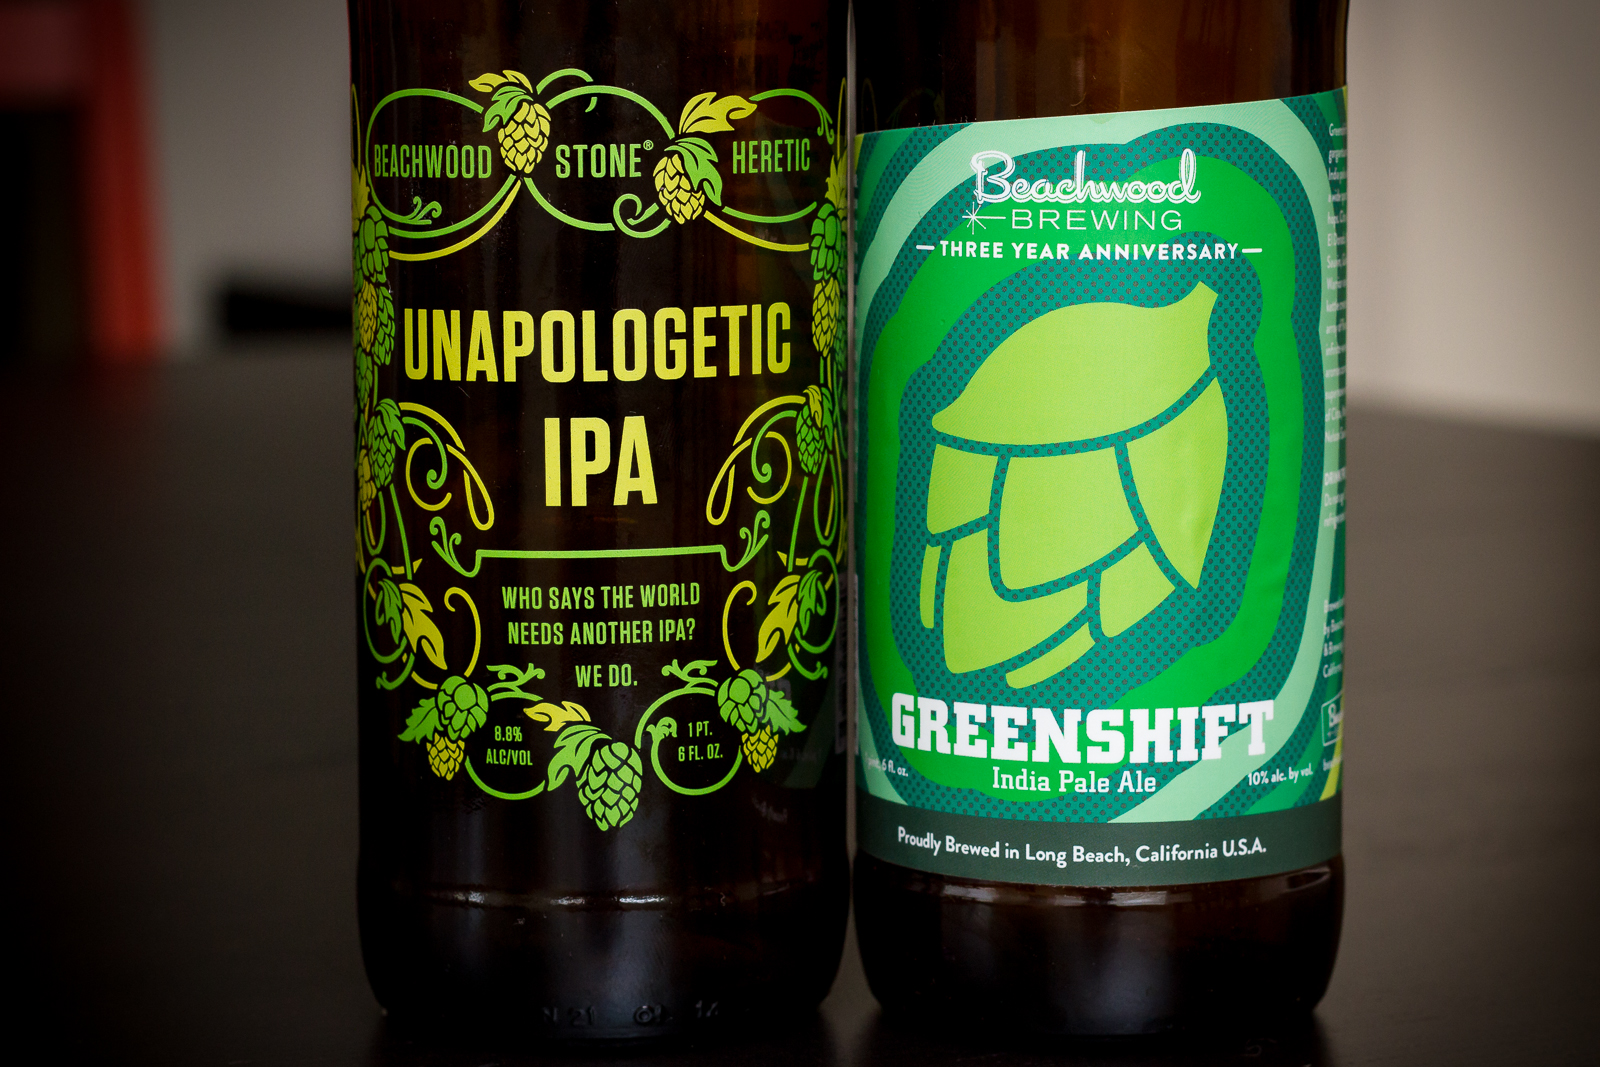 Stone Brewing Co./Beachwood Brewing/Heretic Brewing - Unapologetic IPA and Beachwood Brewing's Greenshift IPA